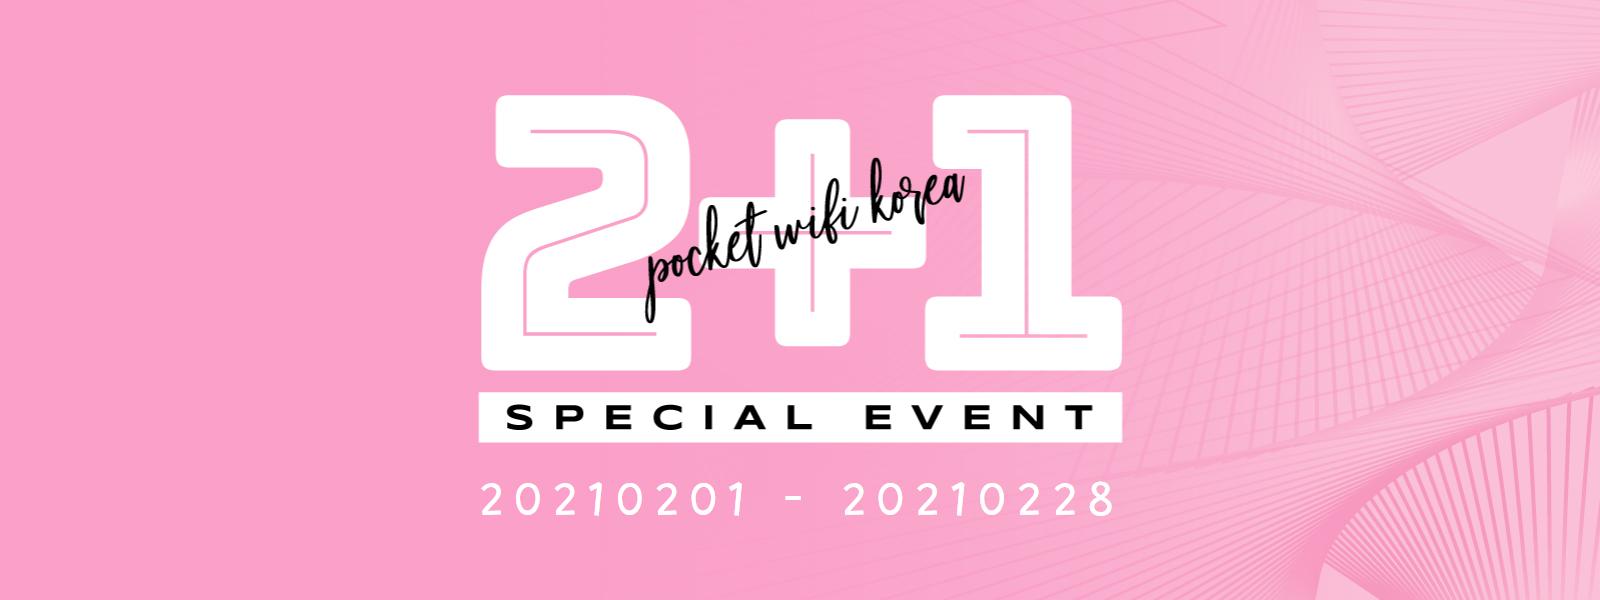 PWK-2021-02